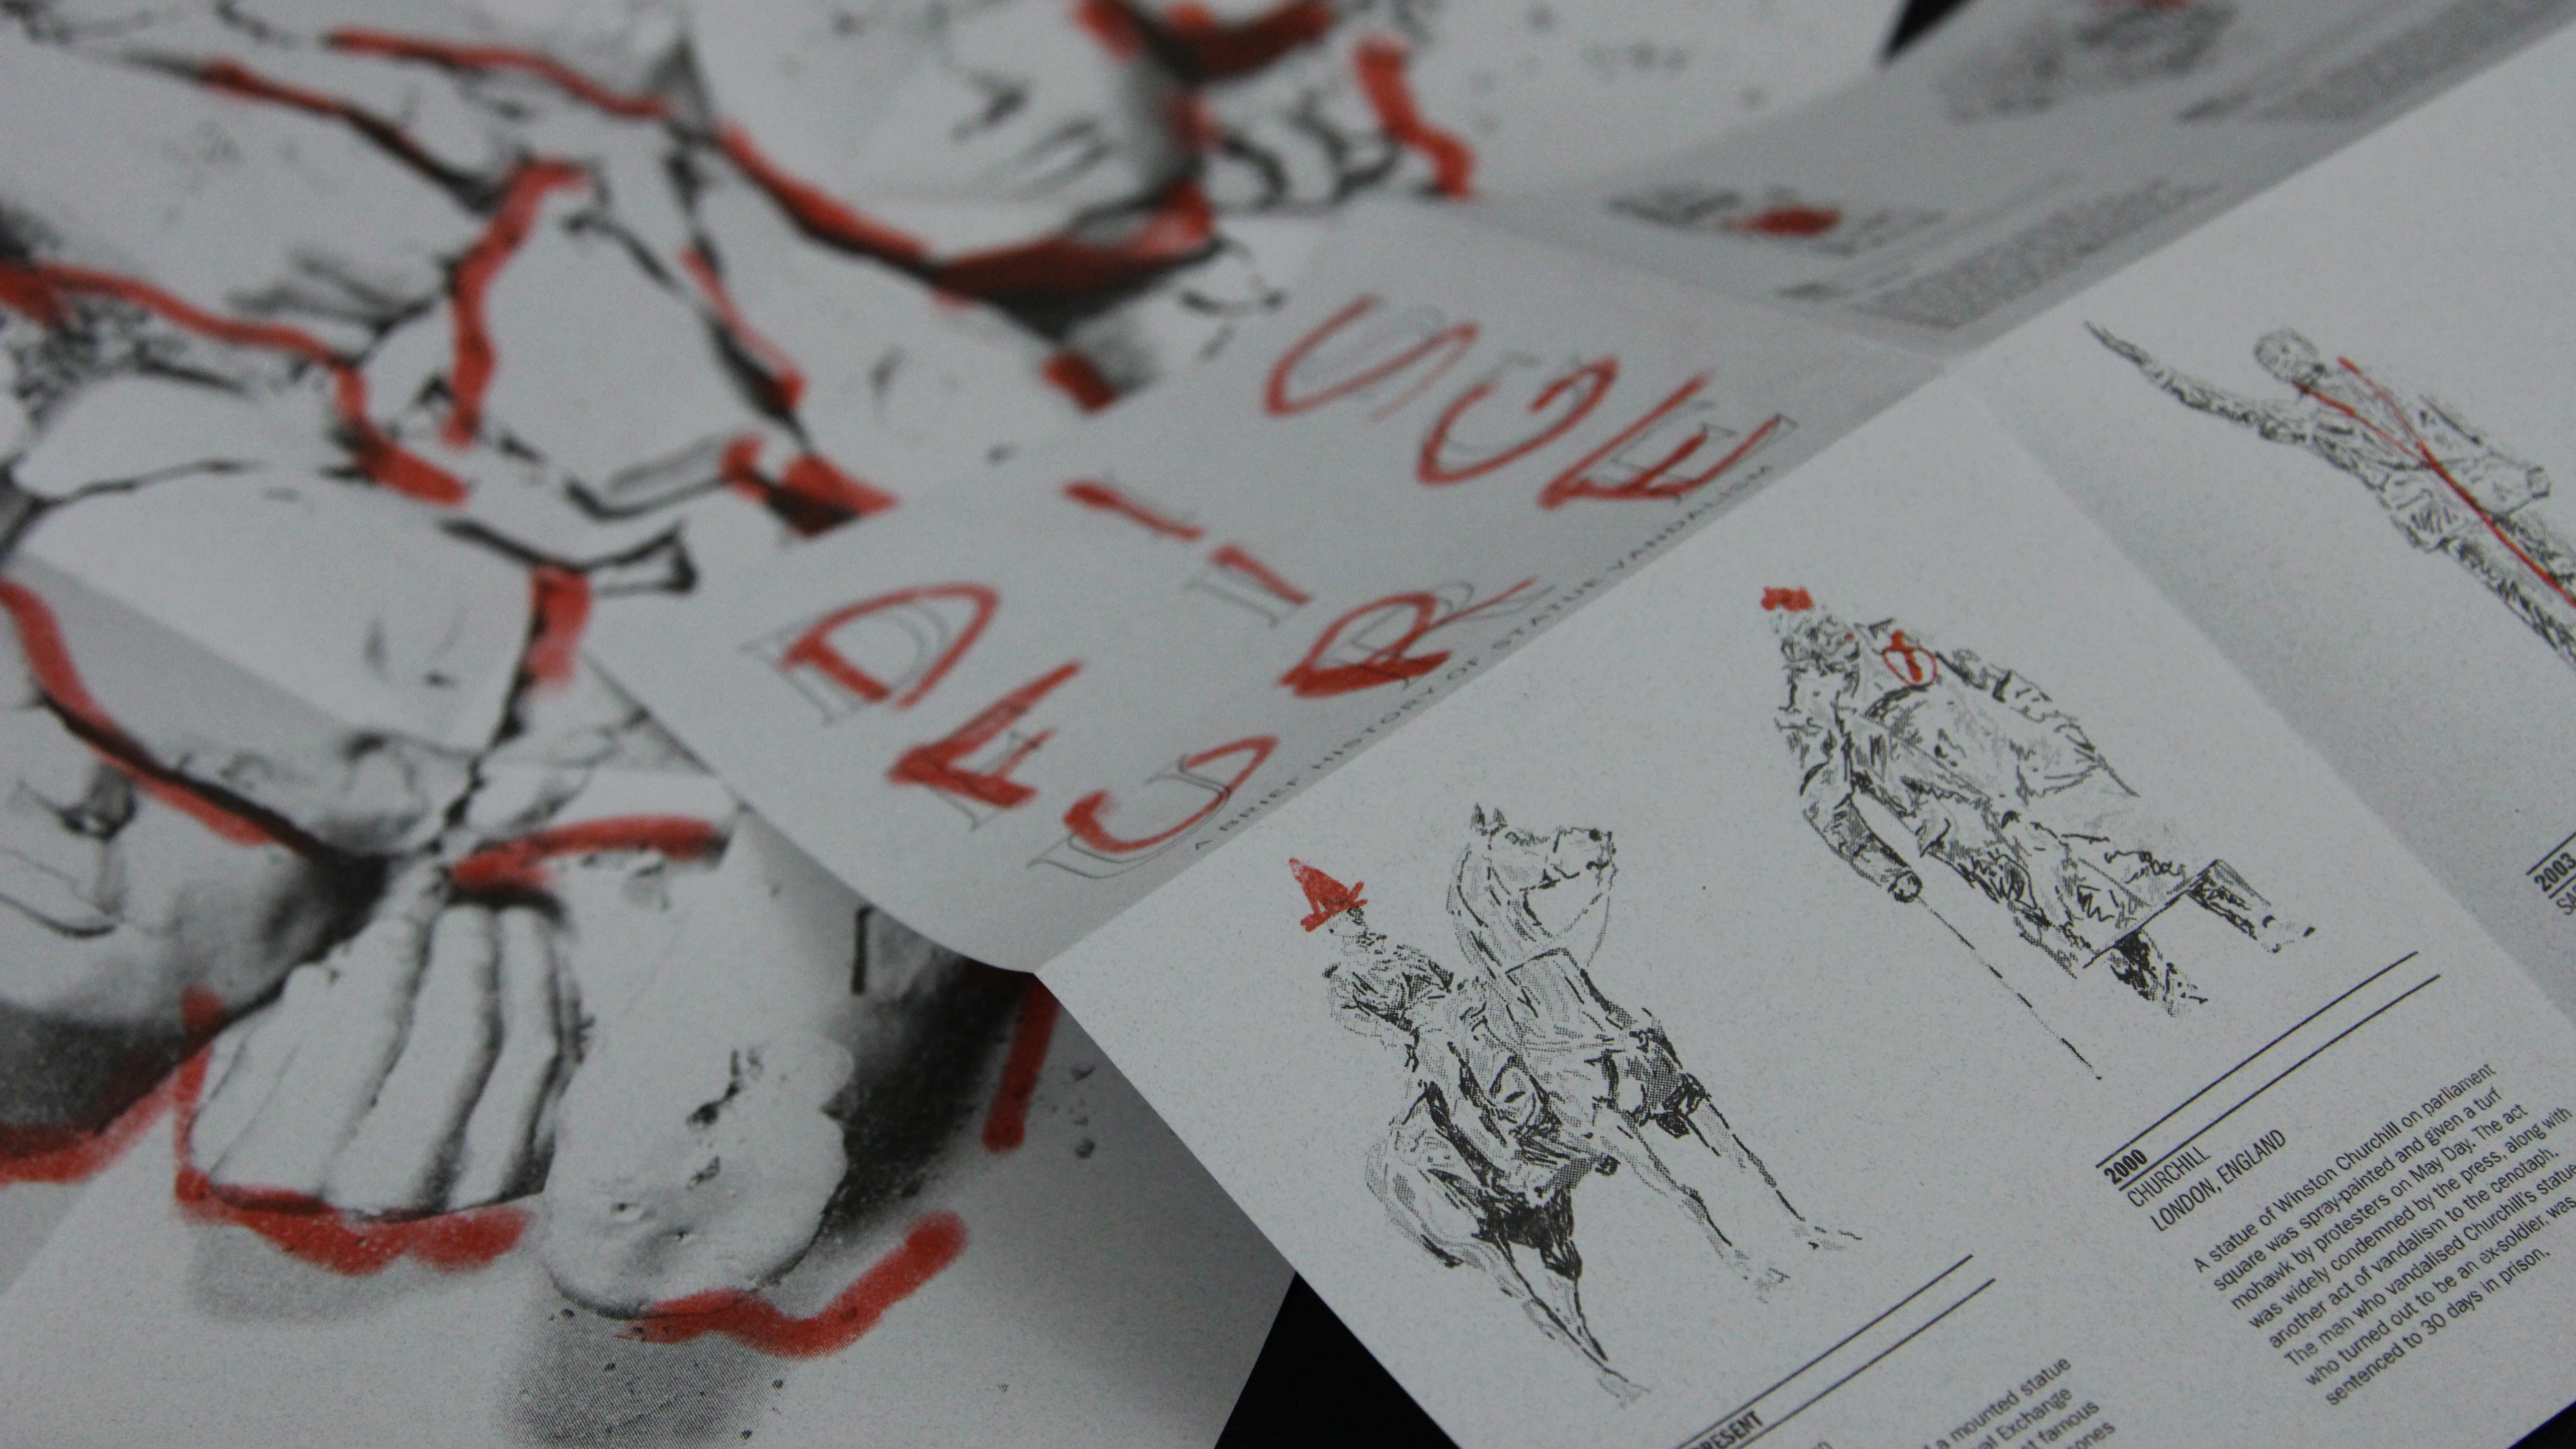 Leeds College of Art degree show 2016: Alec Mezzetti